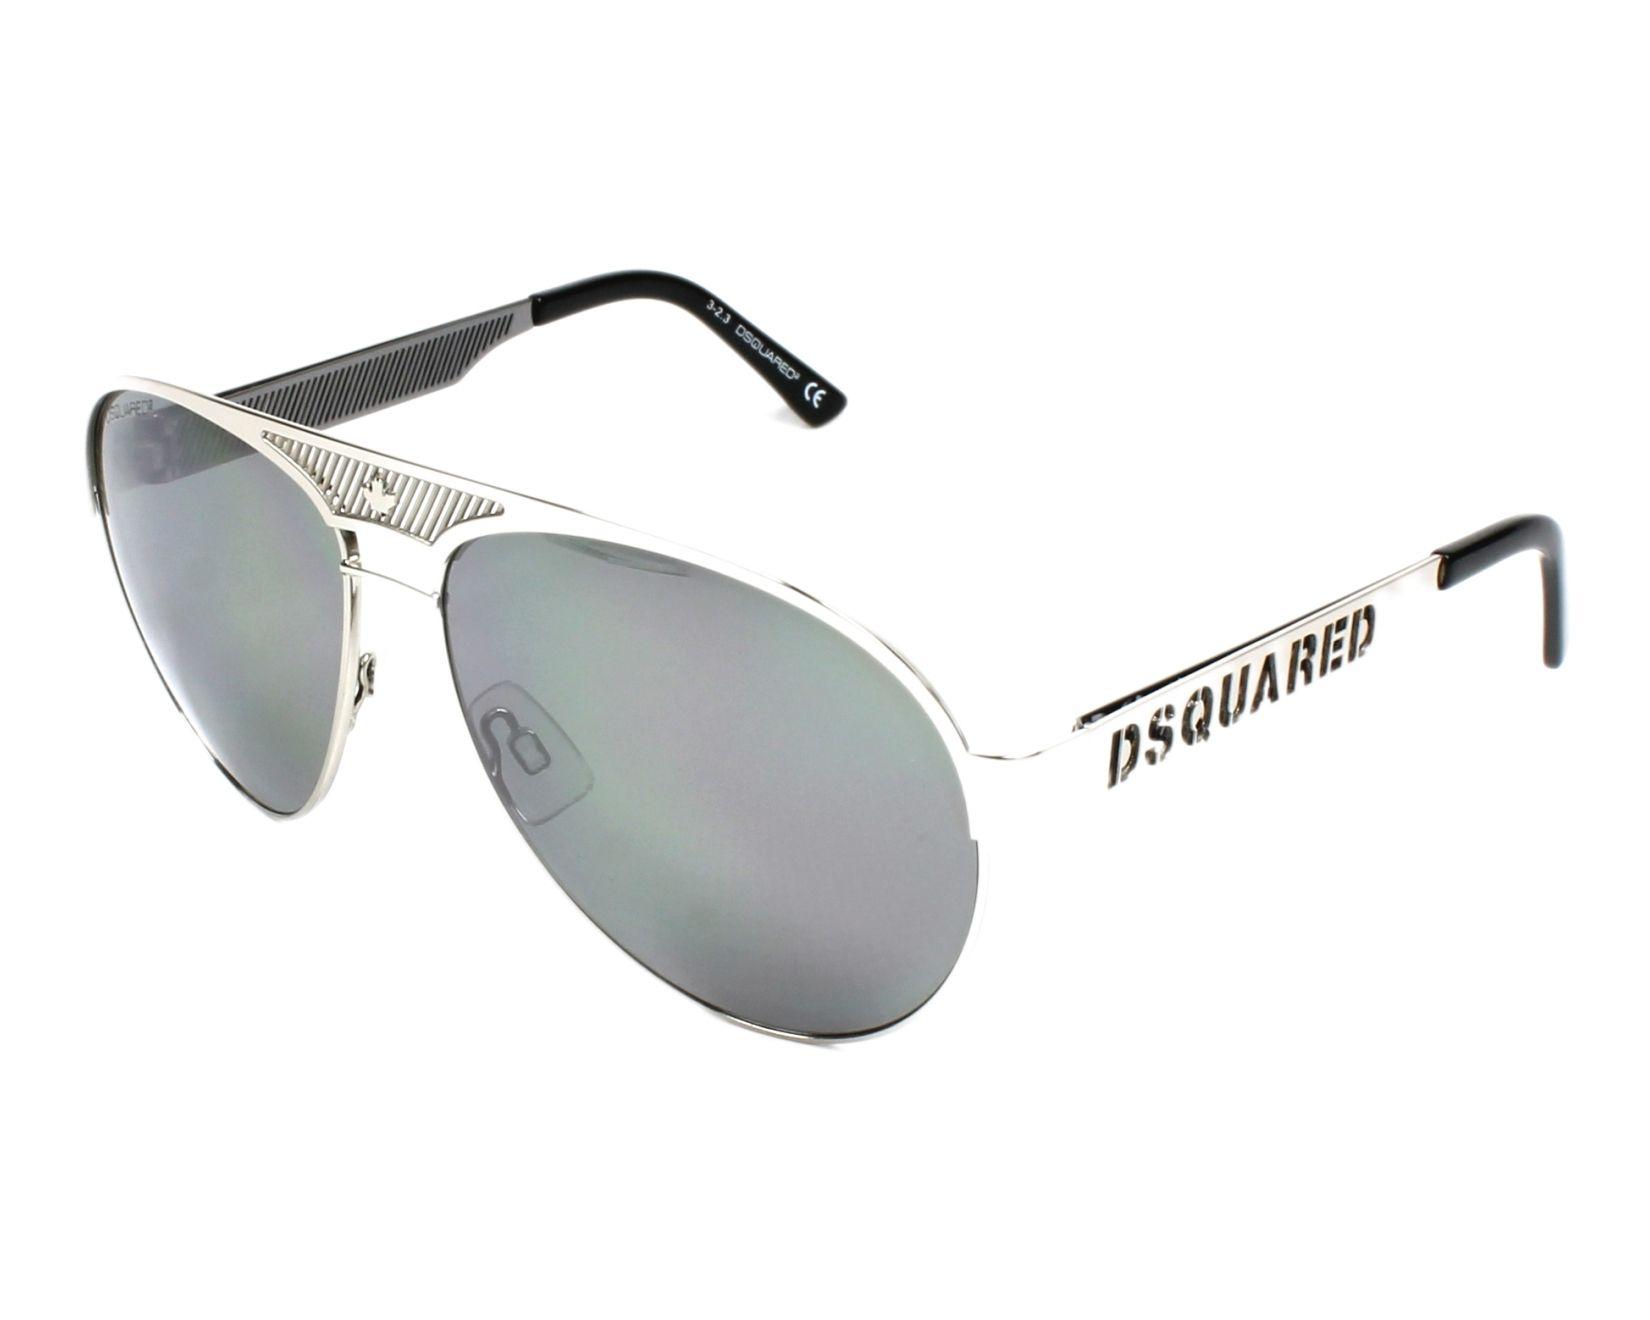 0e3f2e5c6d thumbnail Sunglasses DSQUARED DQ-0138 20C - Silver profile view